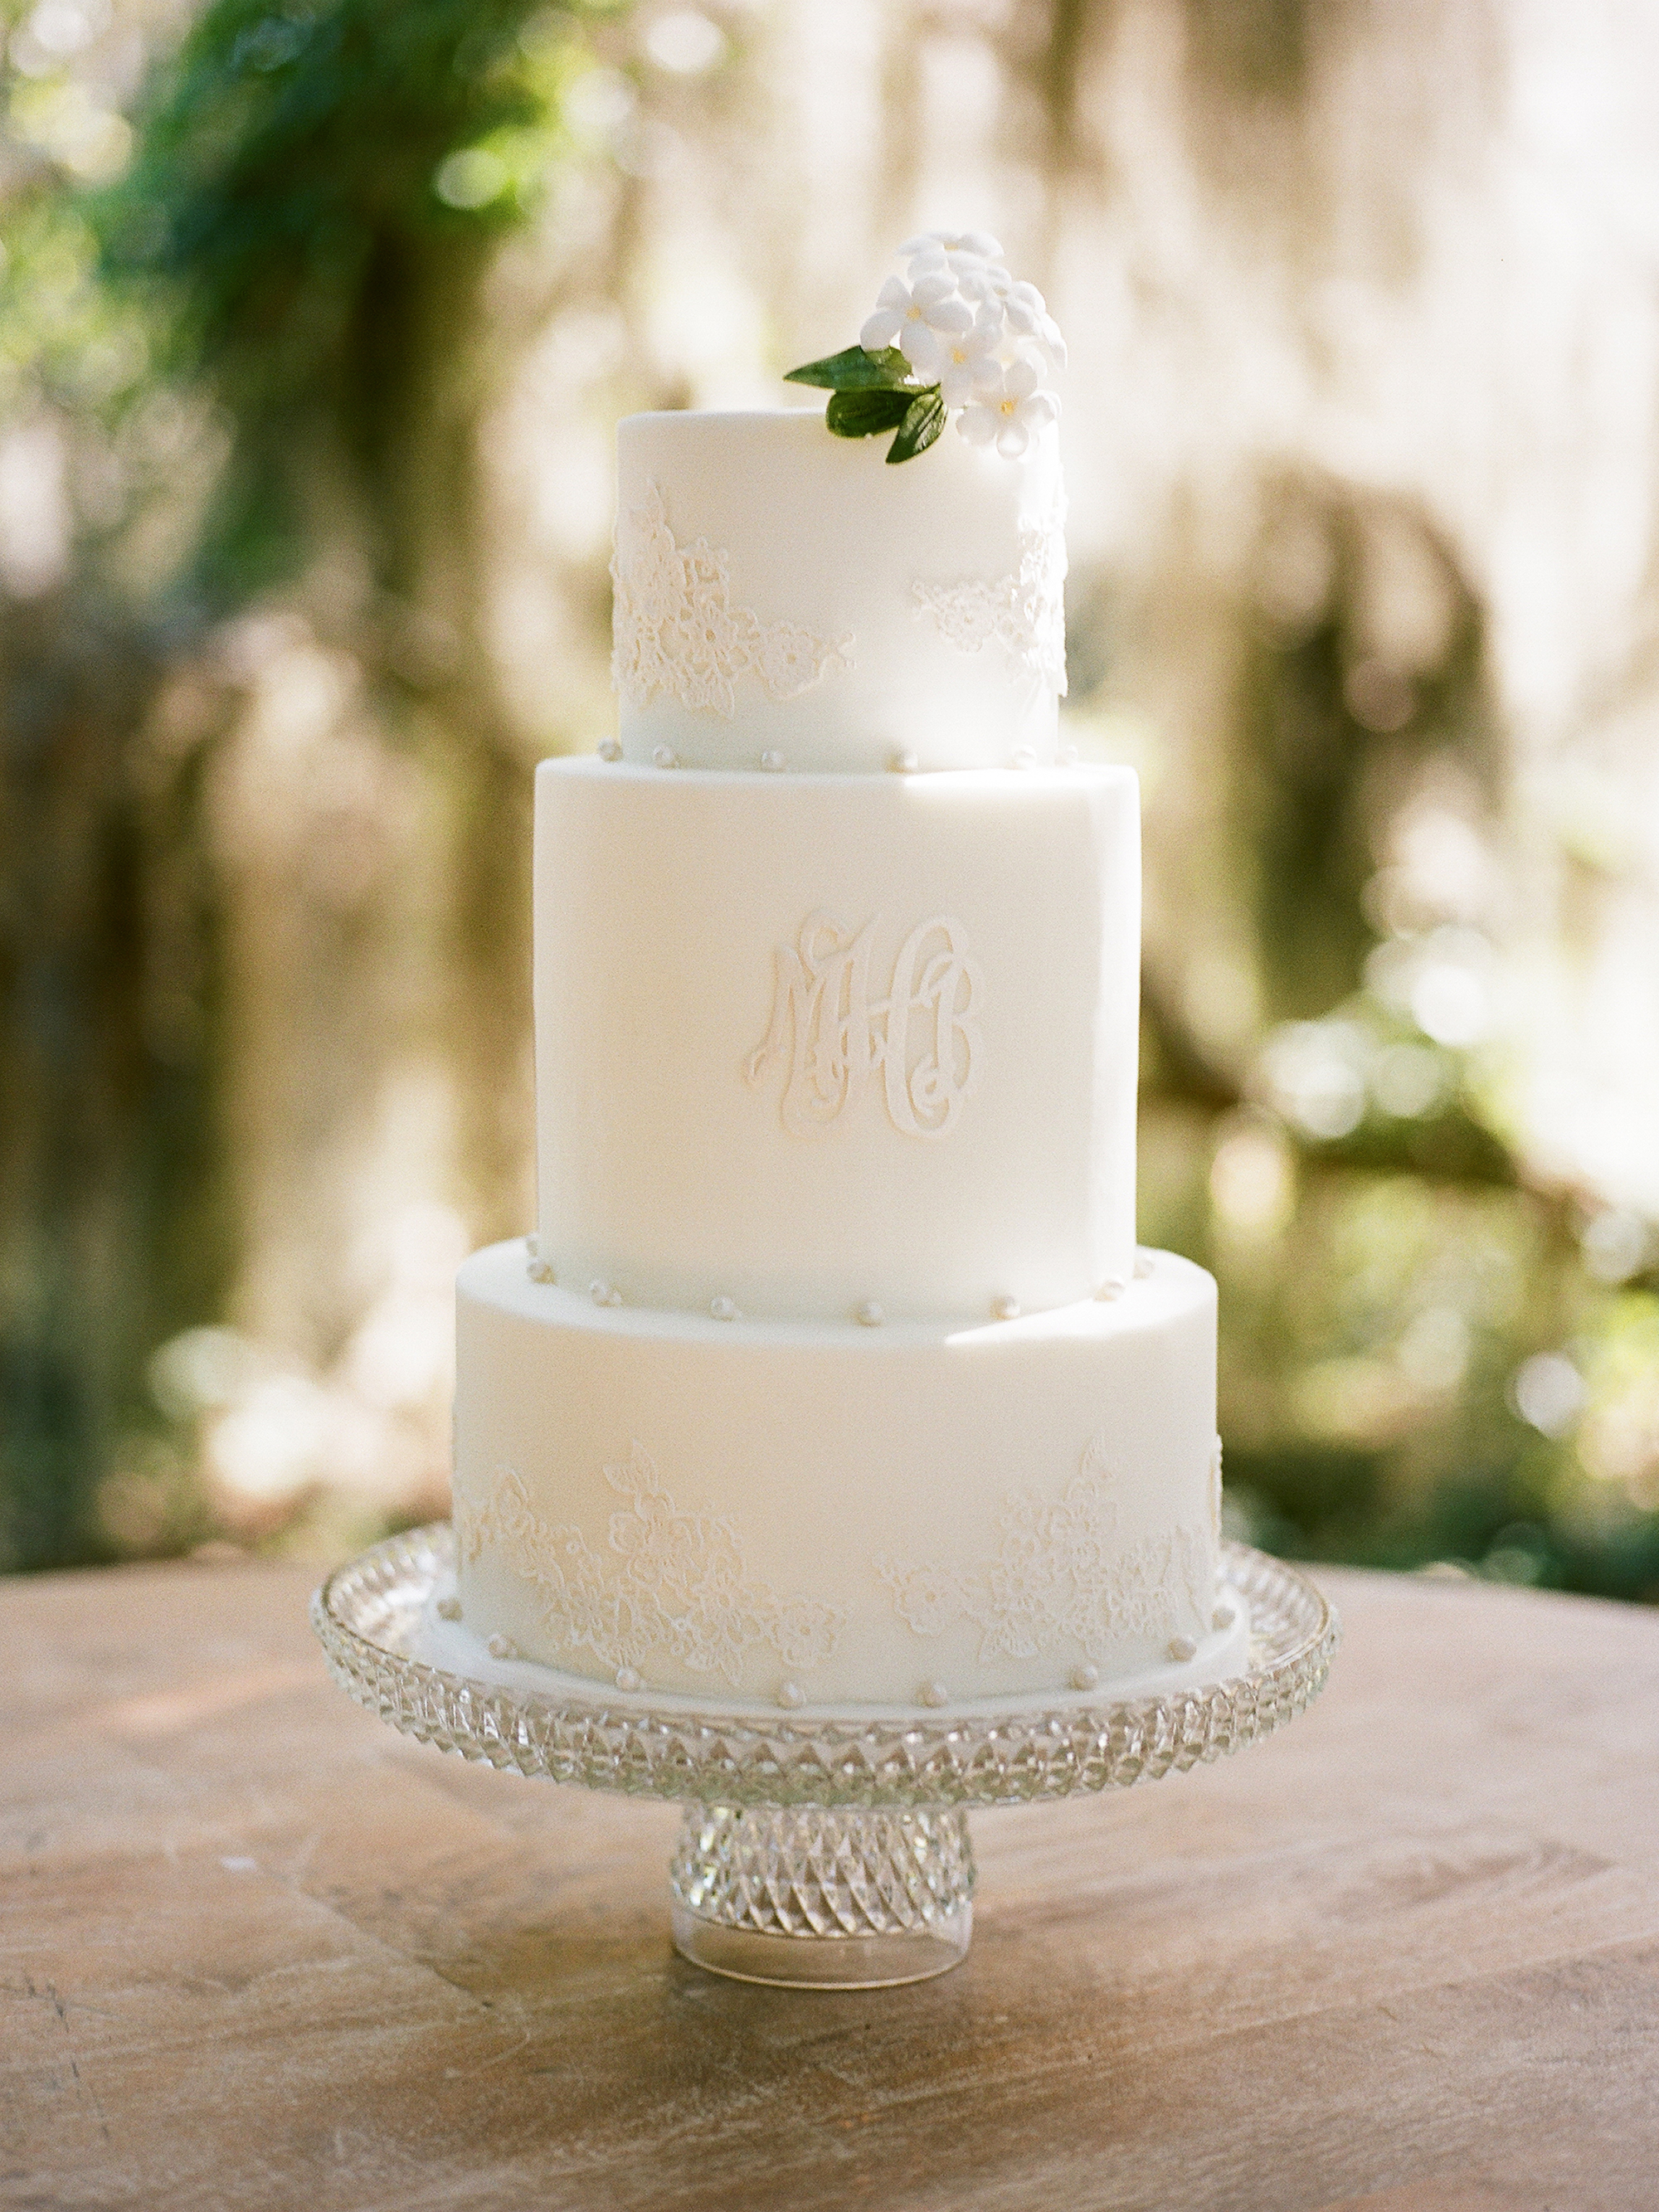 monogram wedding cake davy whitener minette rushing